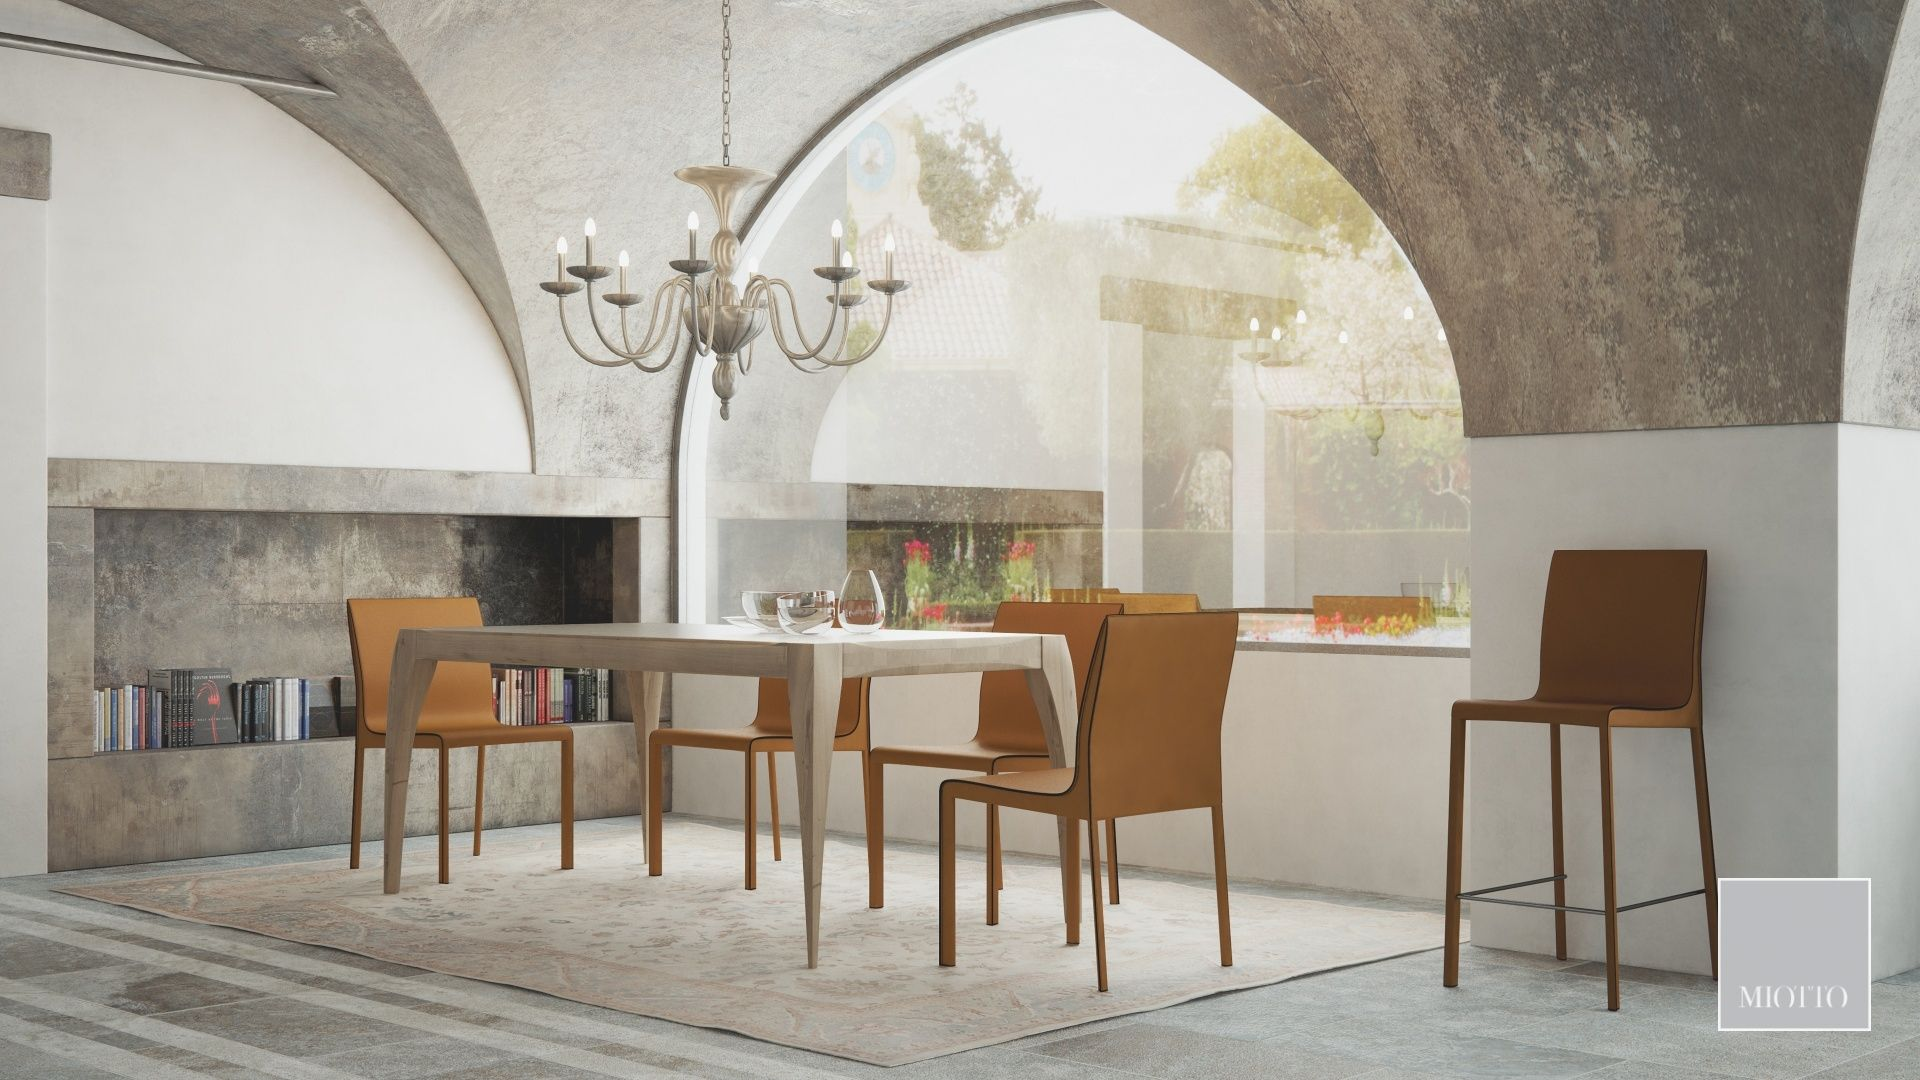 miotto_Breneta dining table, ardini chair stool tan